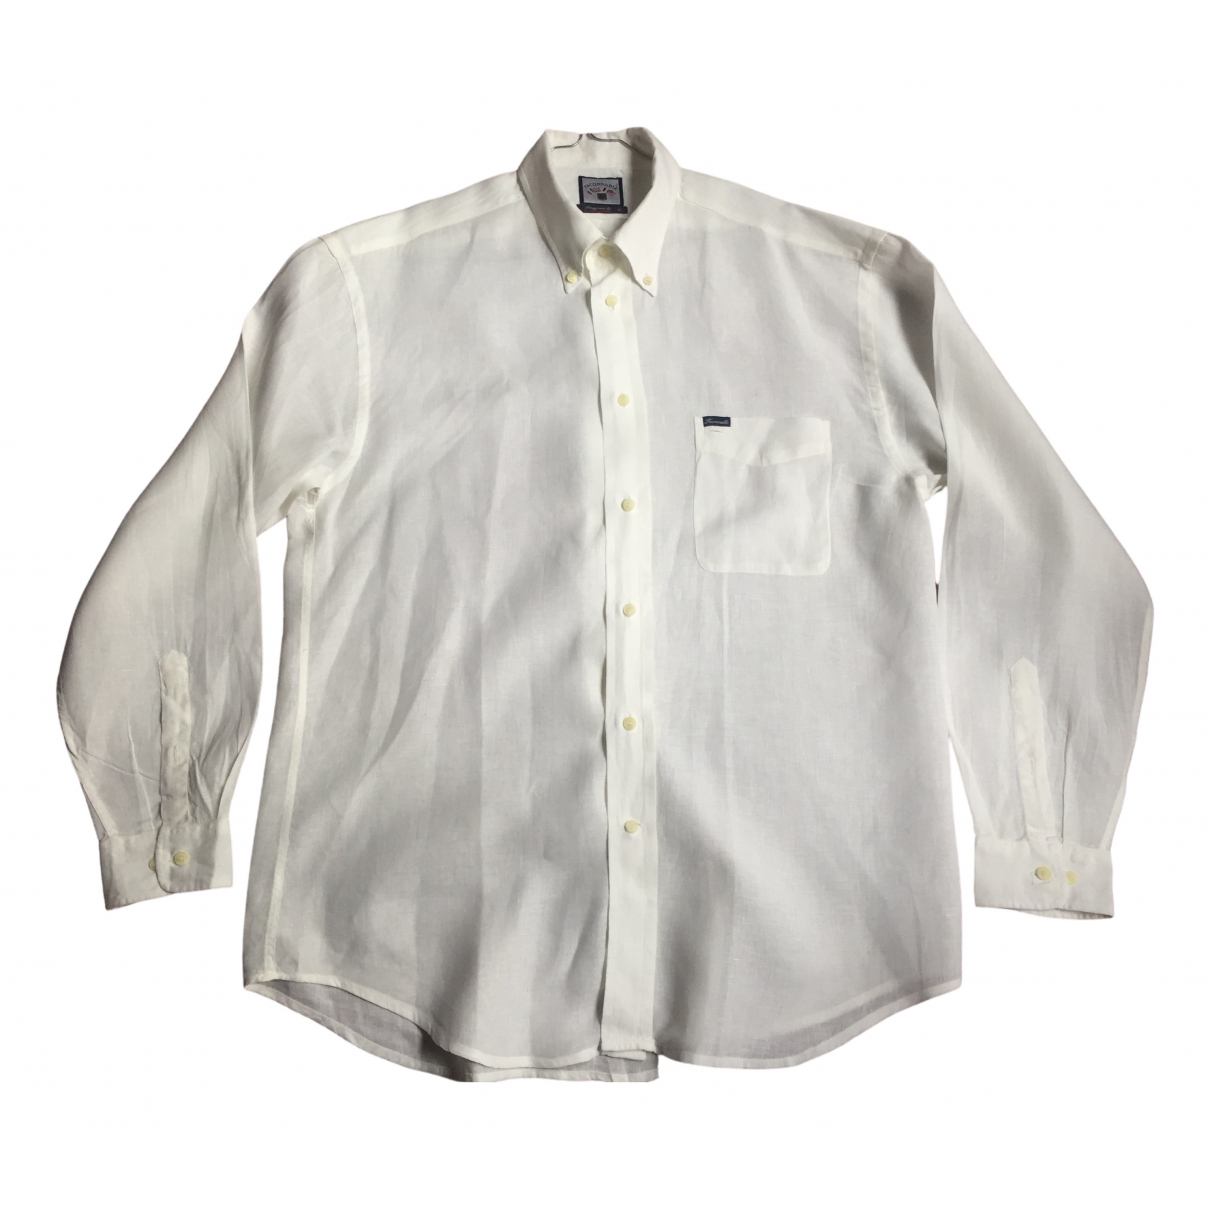 Faconnable \N White Linen Shirts for Men XL International